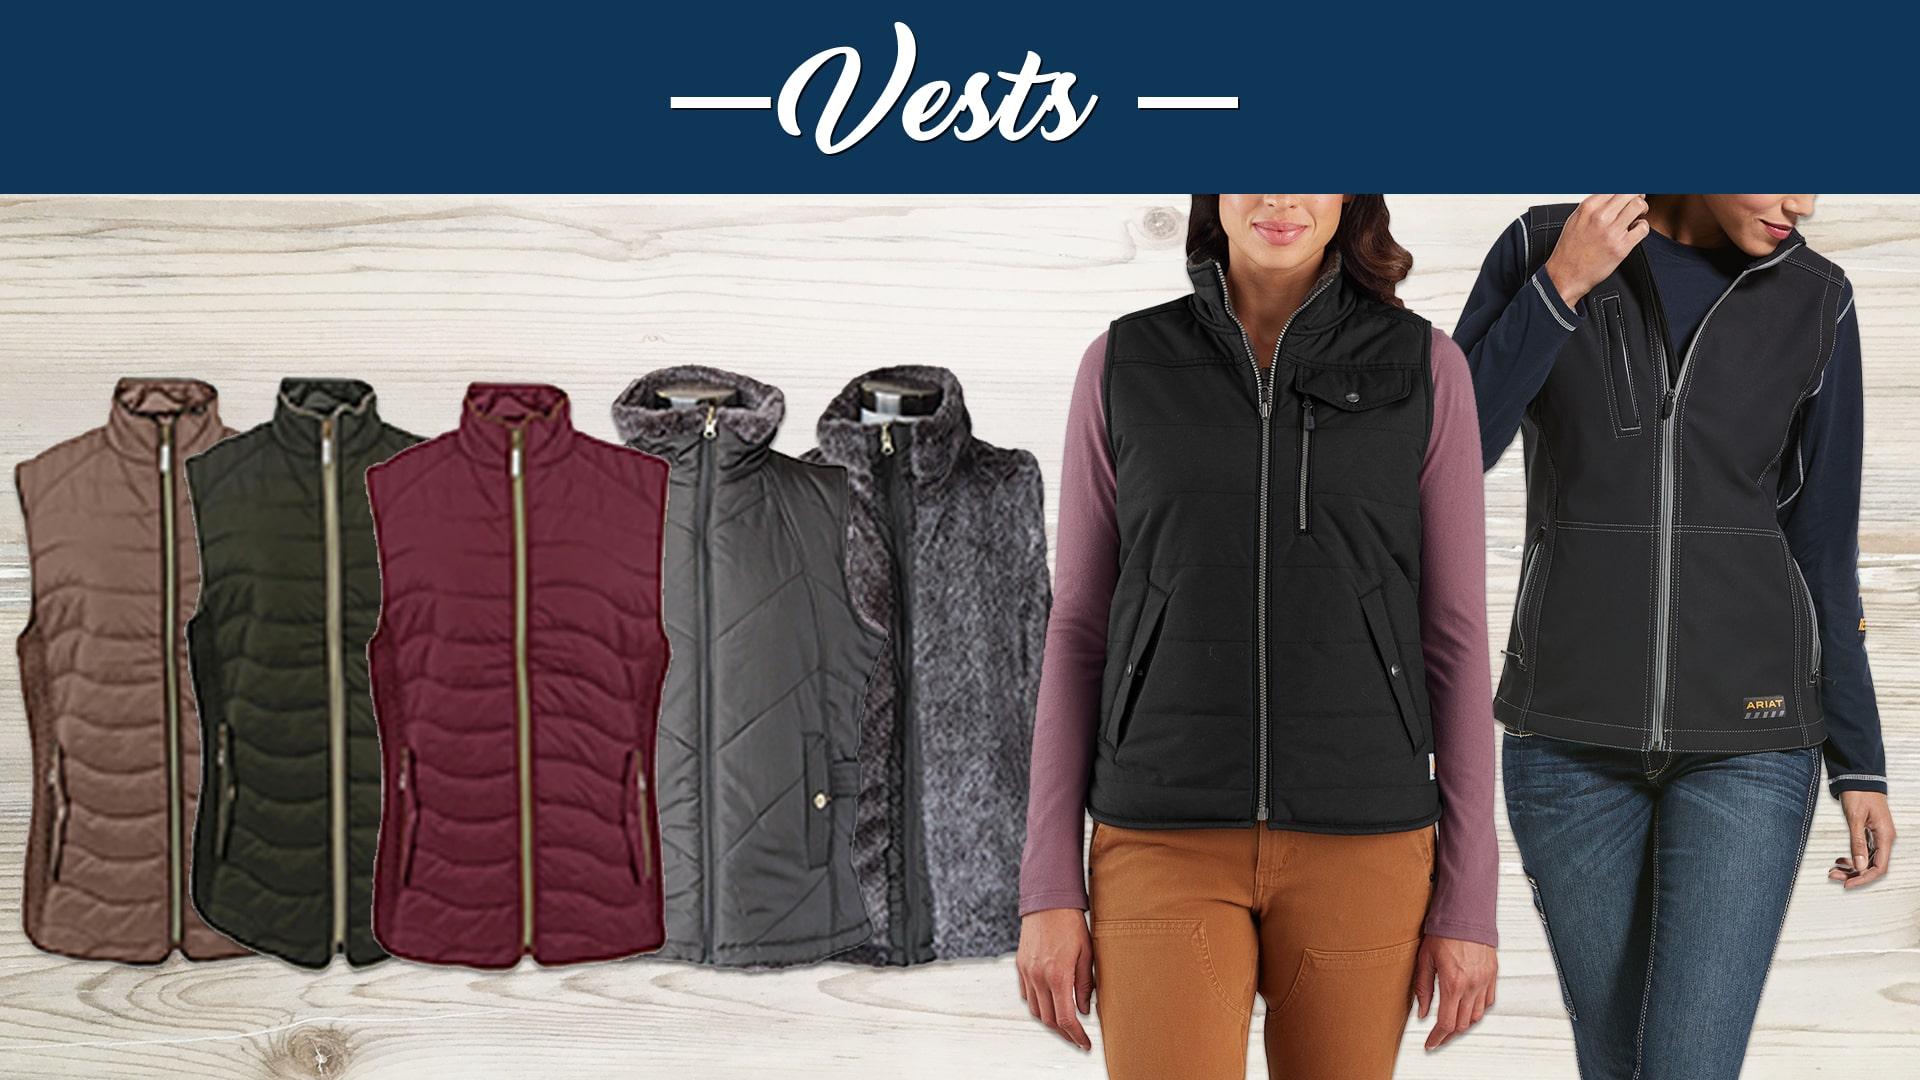 New Ladies Fall Styles Vests